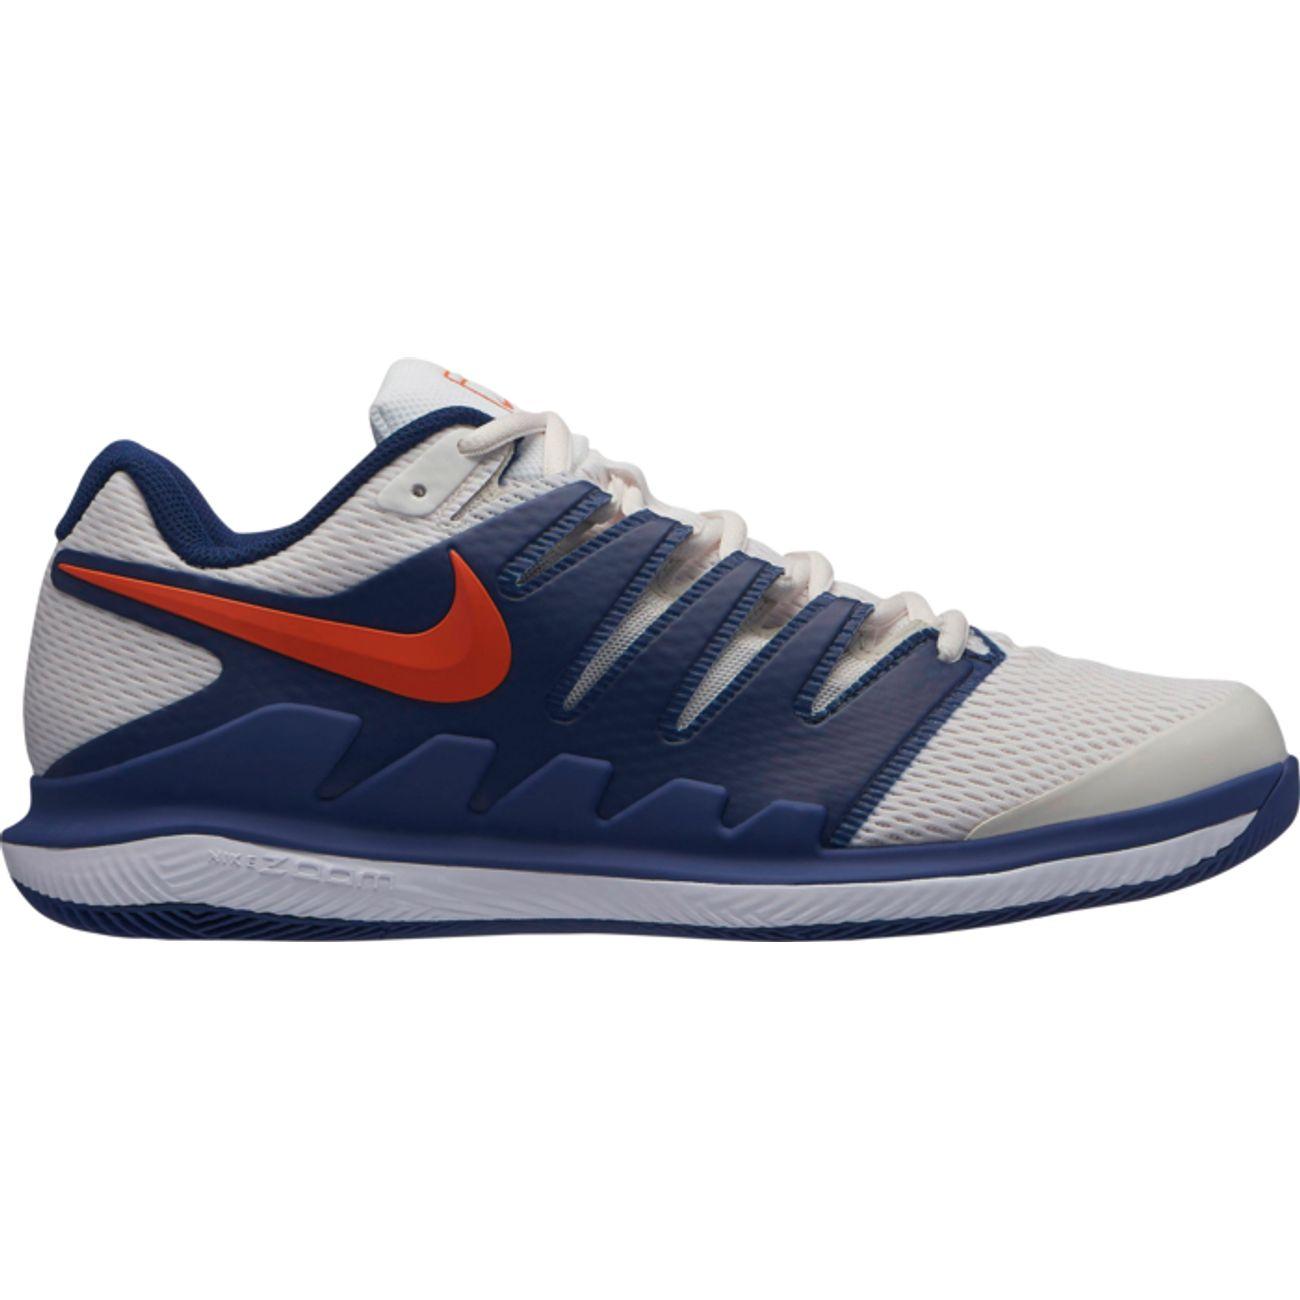 sports shoes 9bdb8 1d5dd NIKE NIKE AIR ZOOM VAPOR X HC